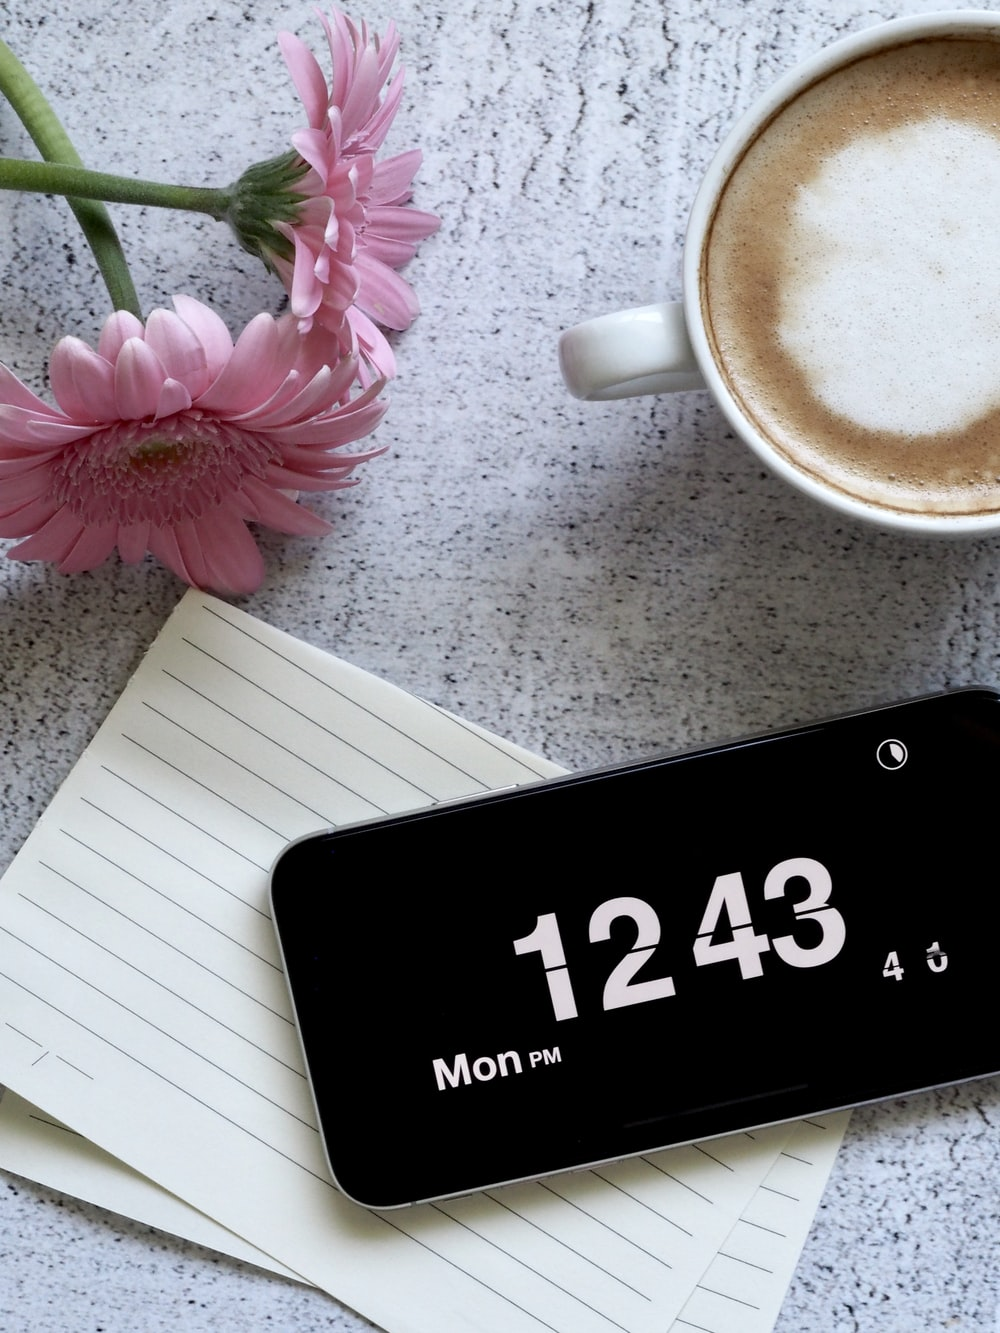 black smartphone displaying 12:43